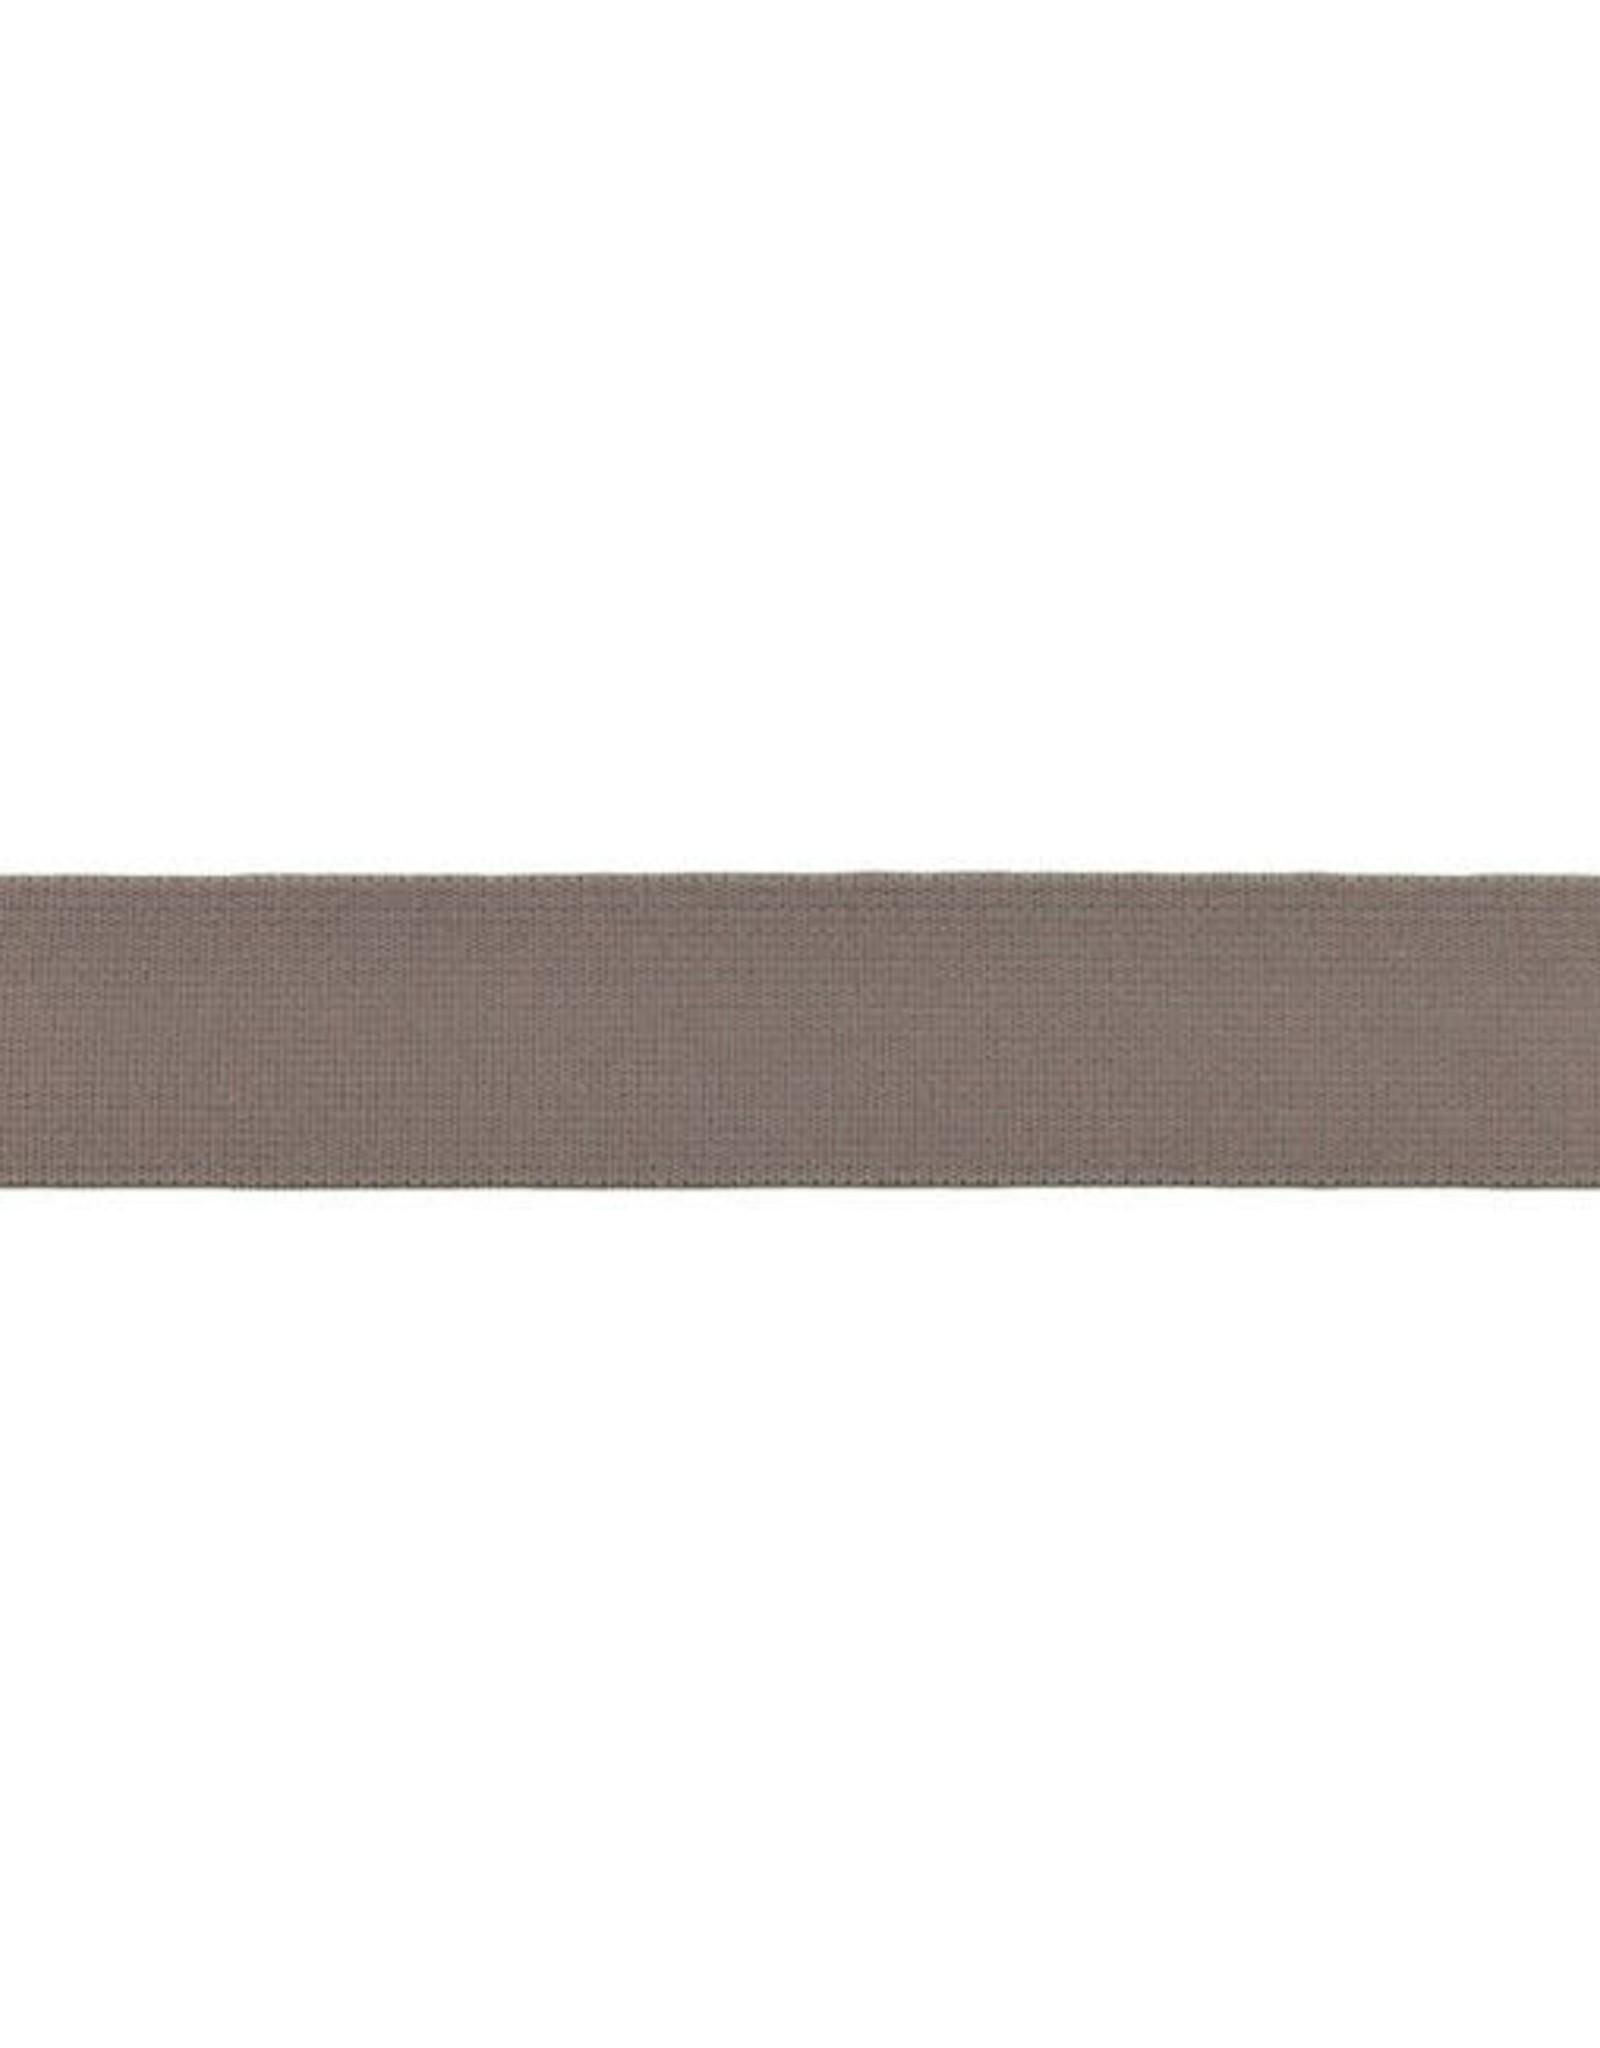 Soft elastiek 25mm - Taupe